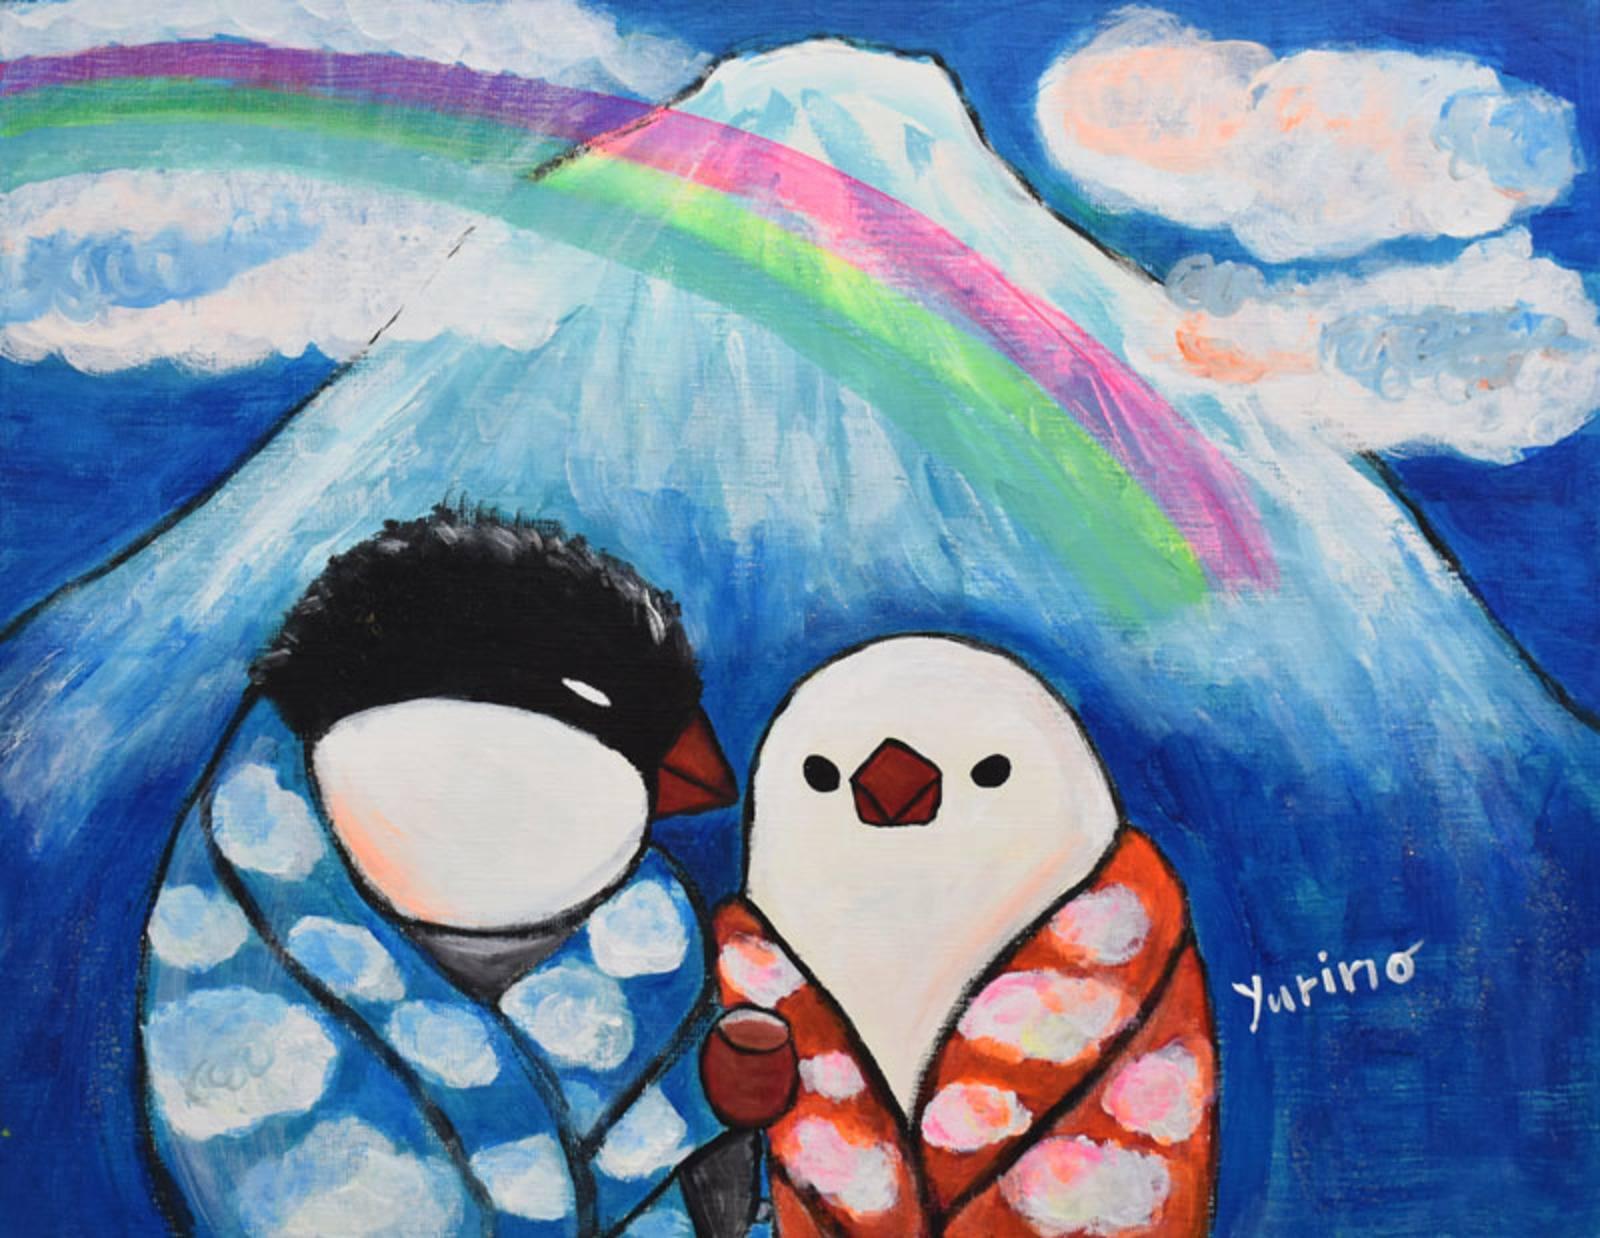 Fuji - bathrobe of the sky